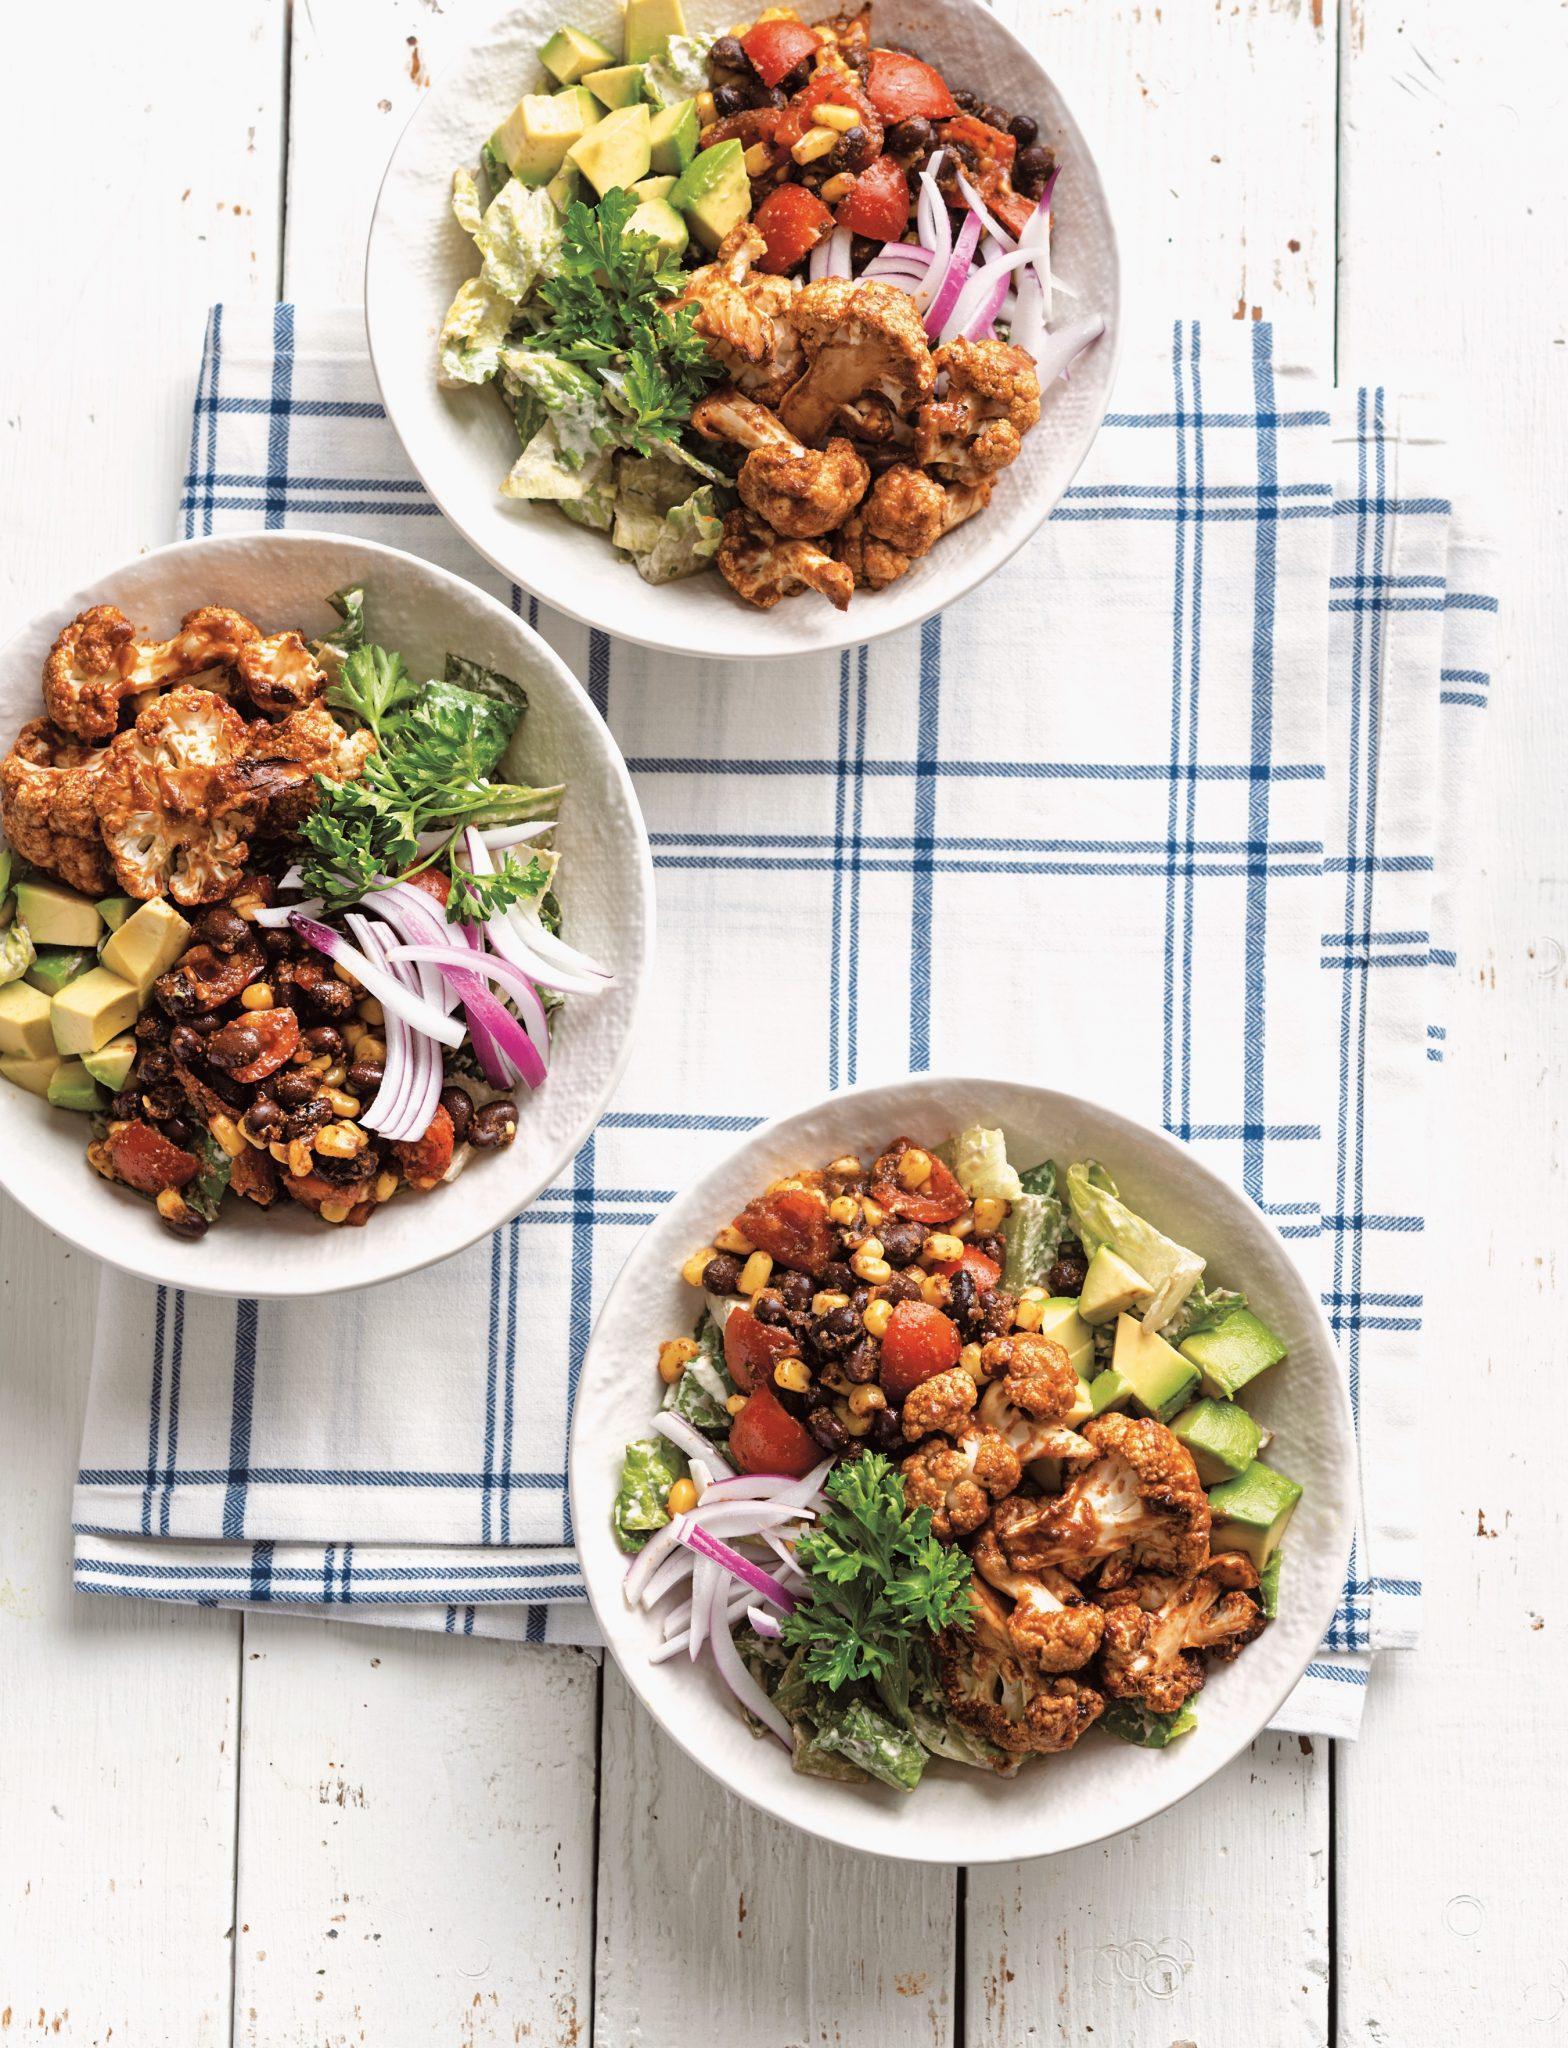 Vegan Cauli-Ranch Salad